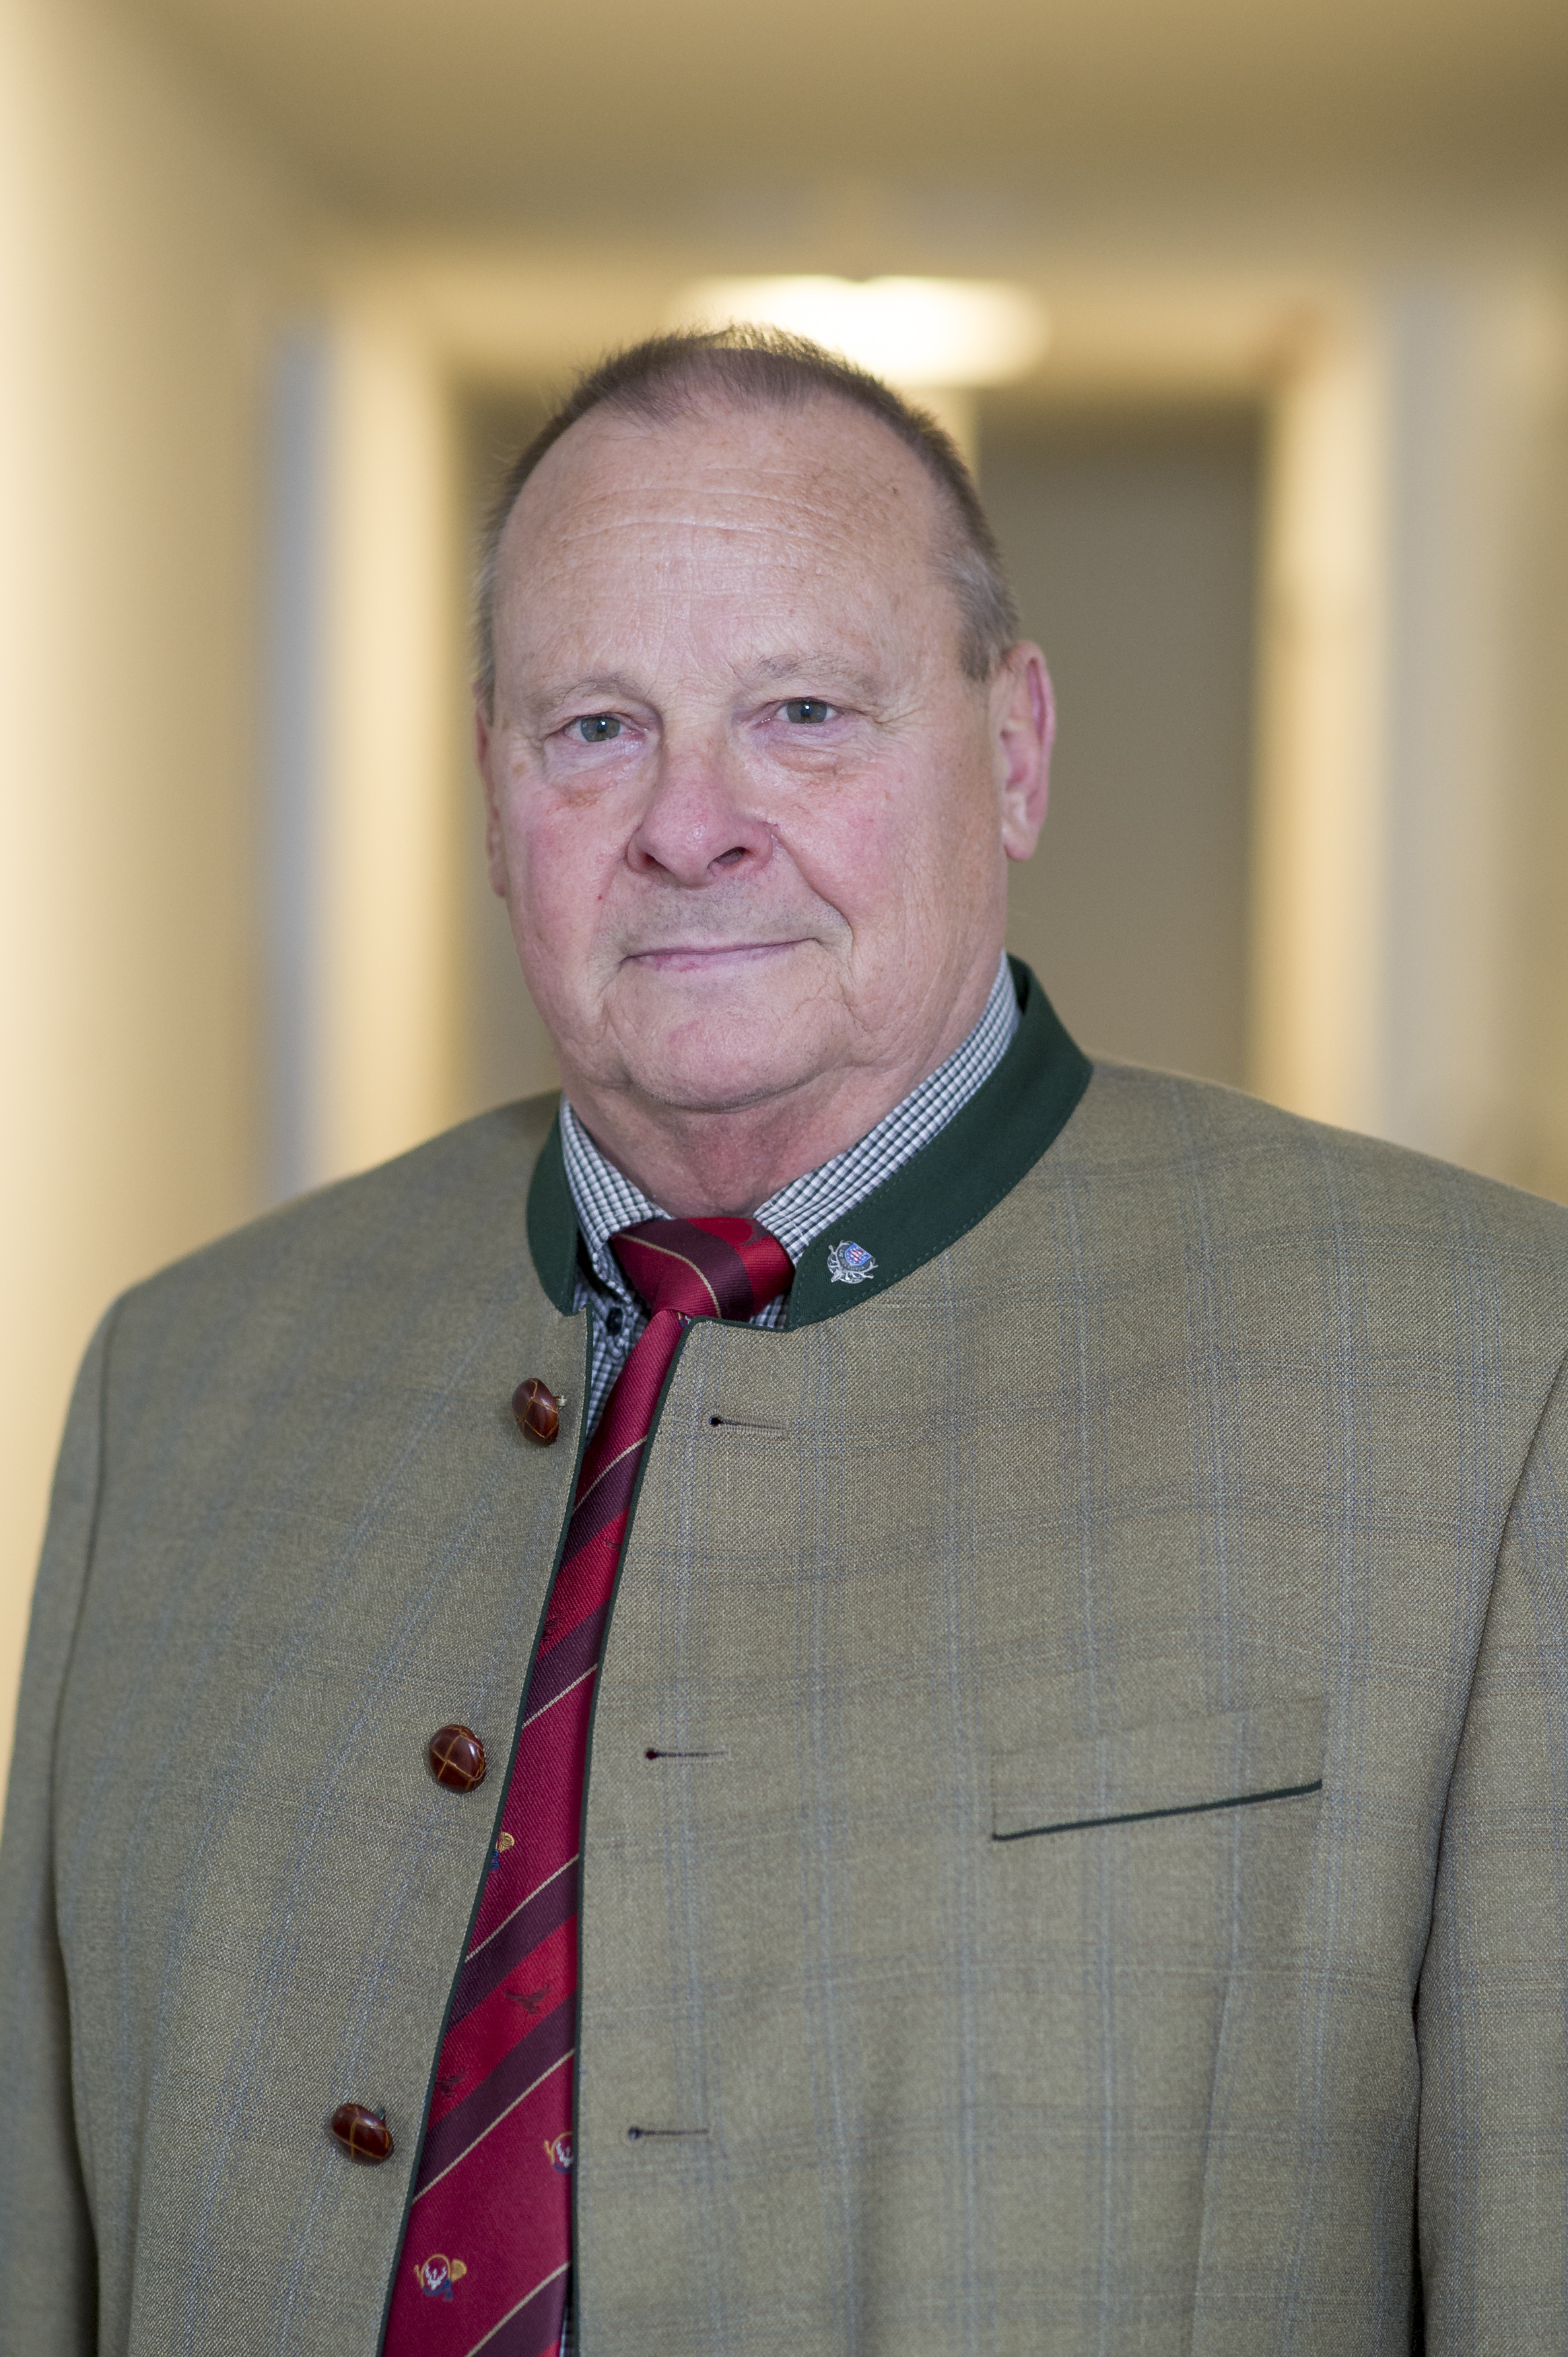 Steffen Liebig, Präsident des Landesjagdverbandes Thüringen